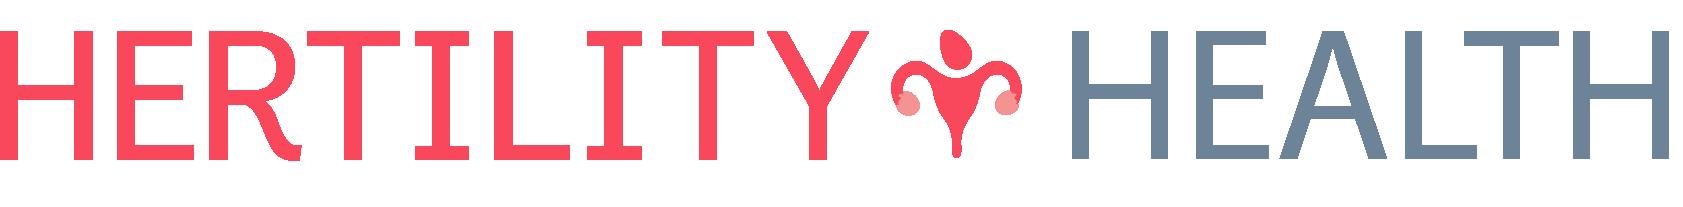 Hertility Logo - Hertility Health